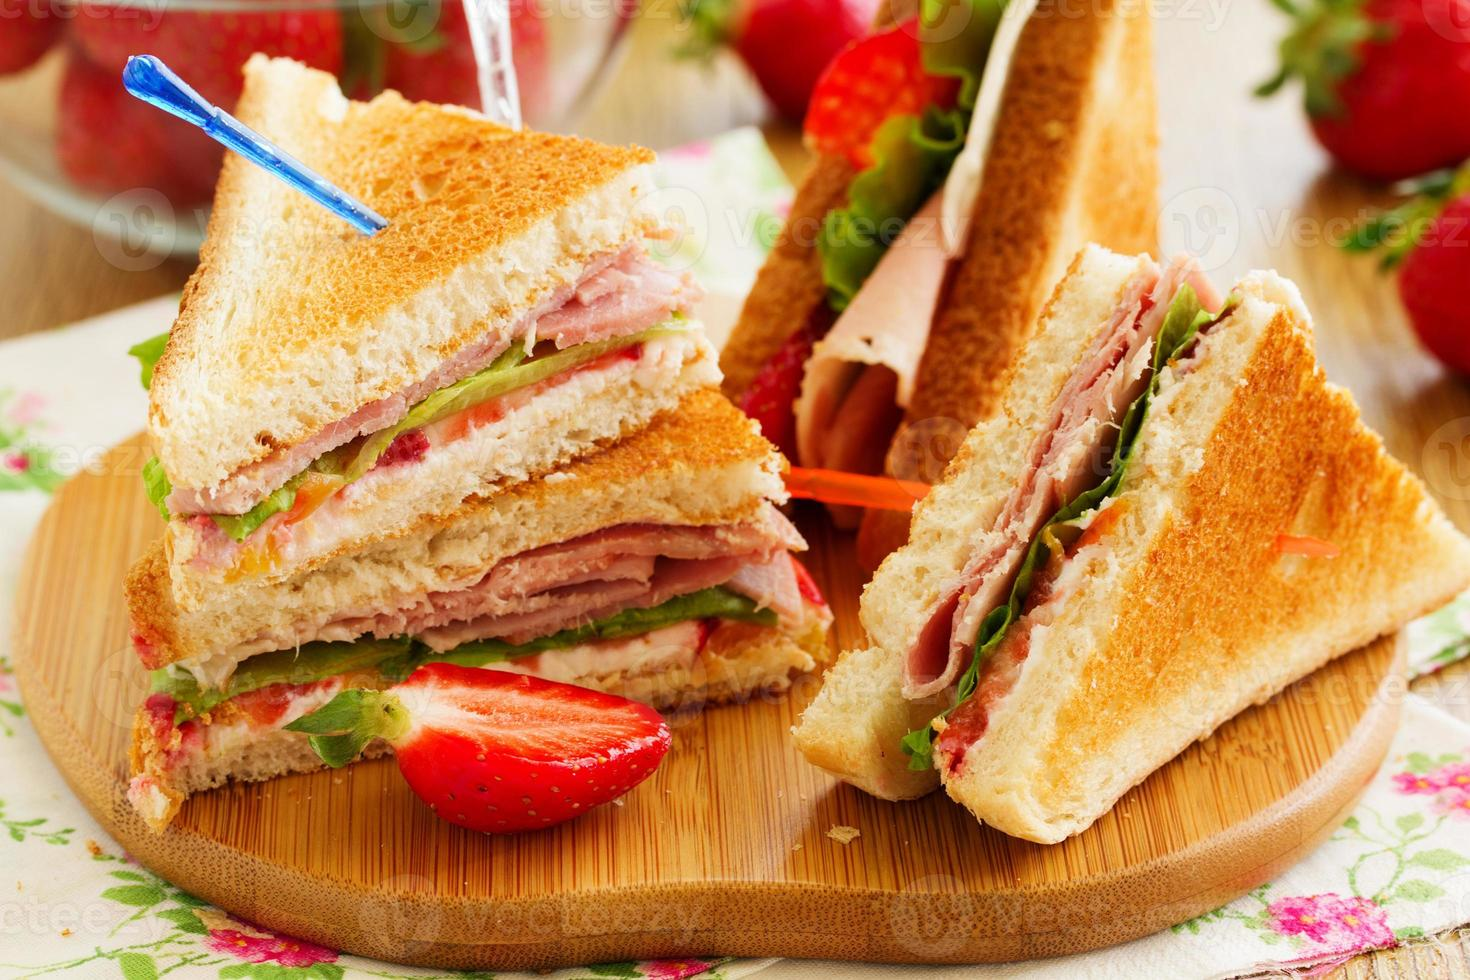 sanduíche de peru dietético e morango. foto